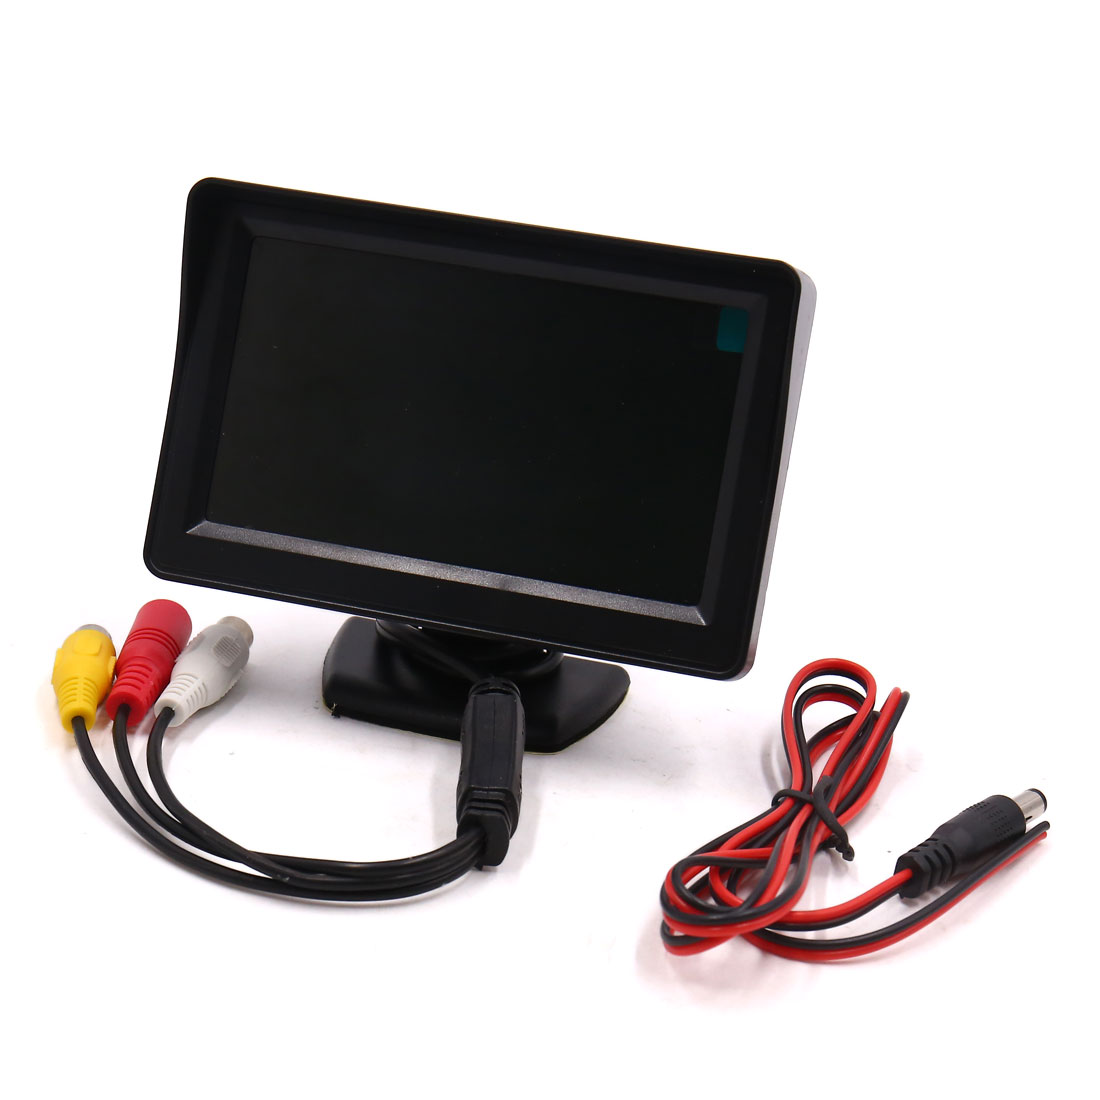 DC 6V-32V 4.3 Inch Digital TFT LCD Color Backup Camera Monitor for Auto Car - image 3 of 3